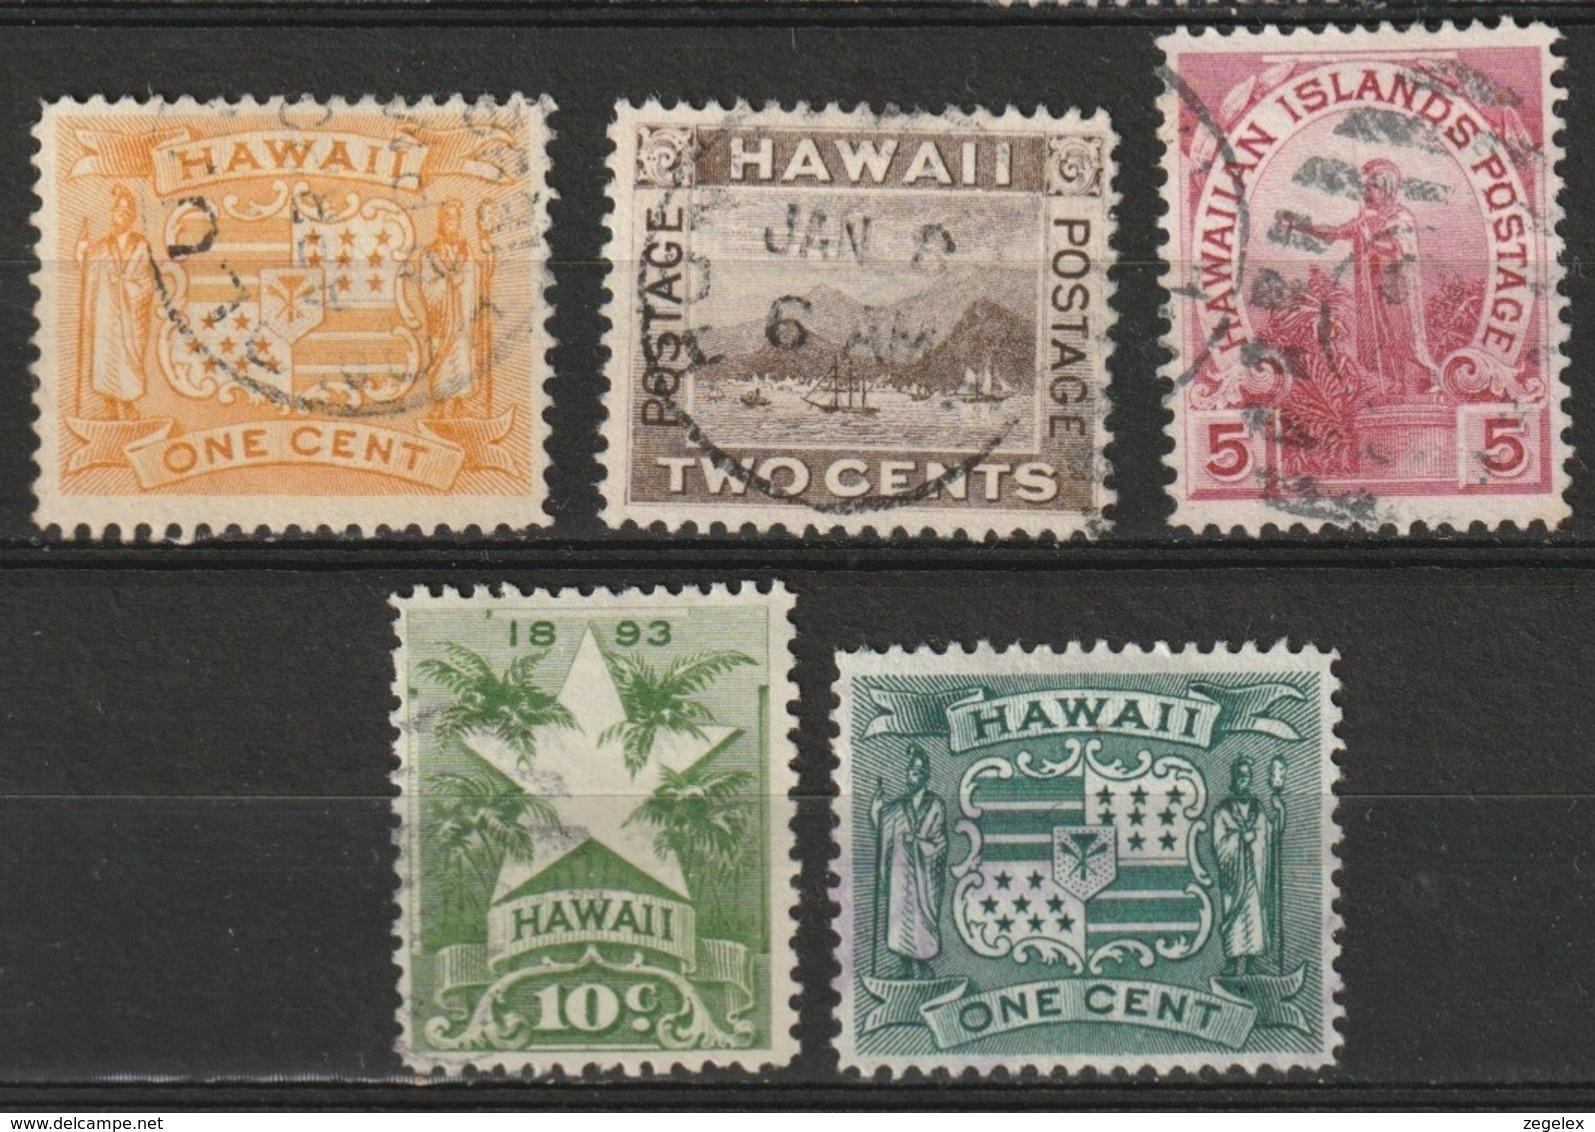 Hawaii 1894 1, 2, 5, 10 And 1 Cent Yvert 63+ Cancelled - Hawaï